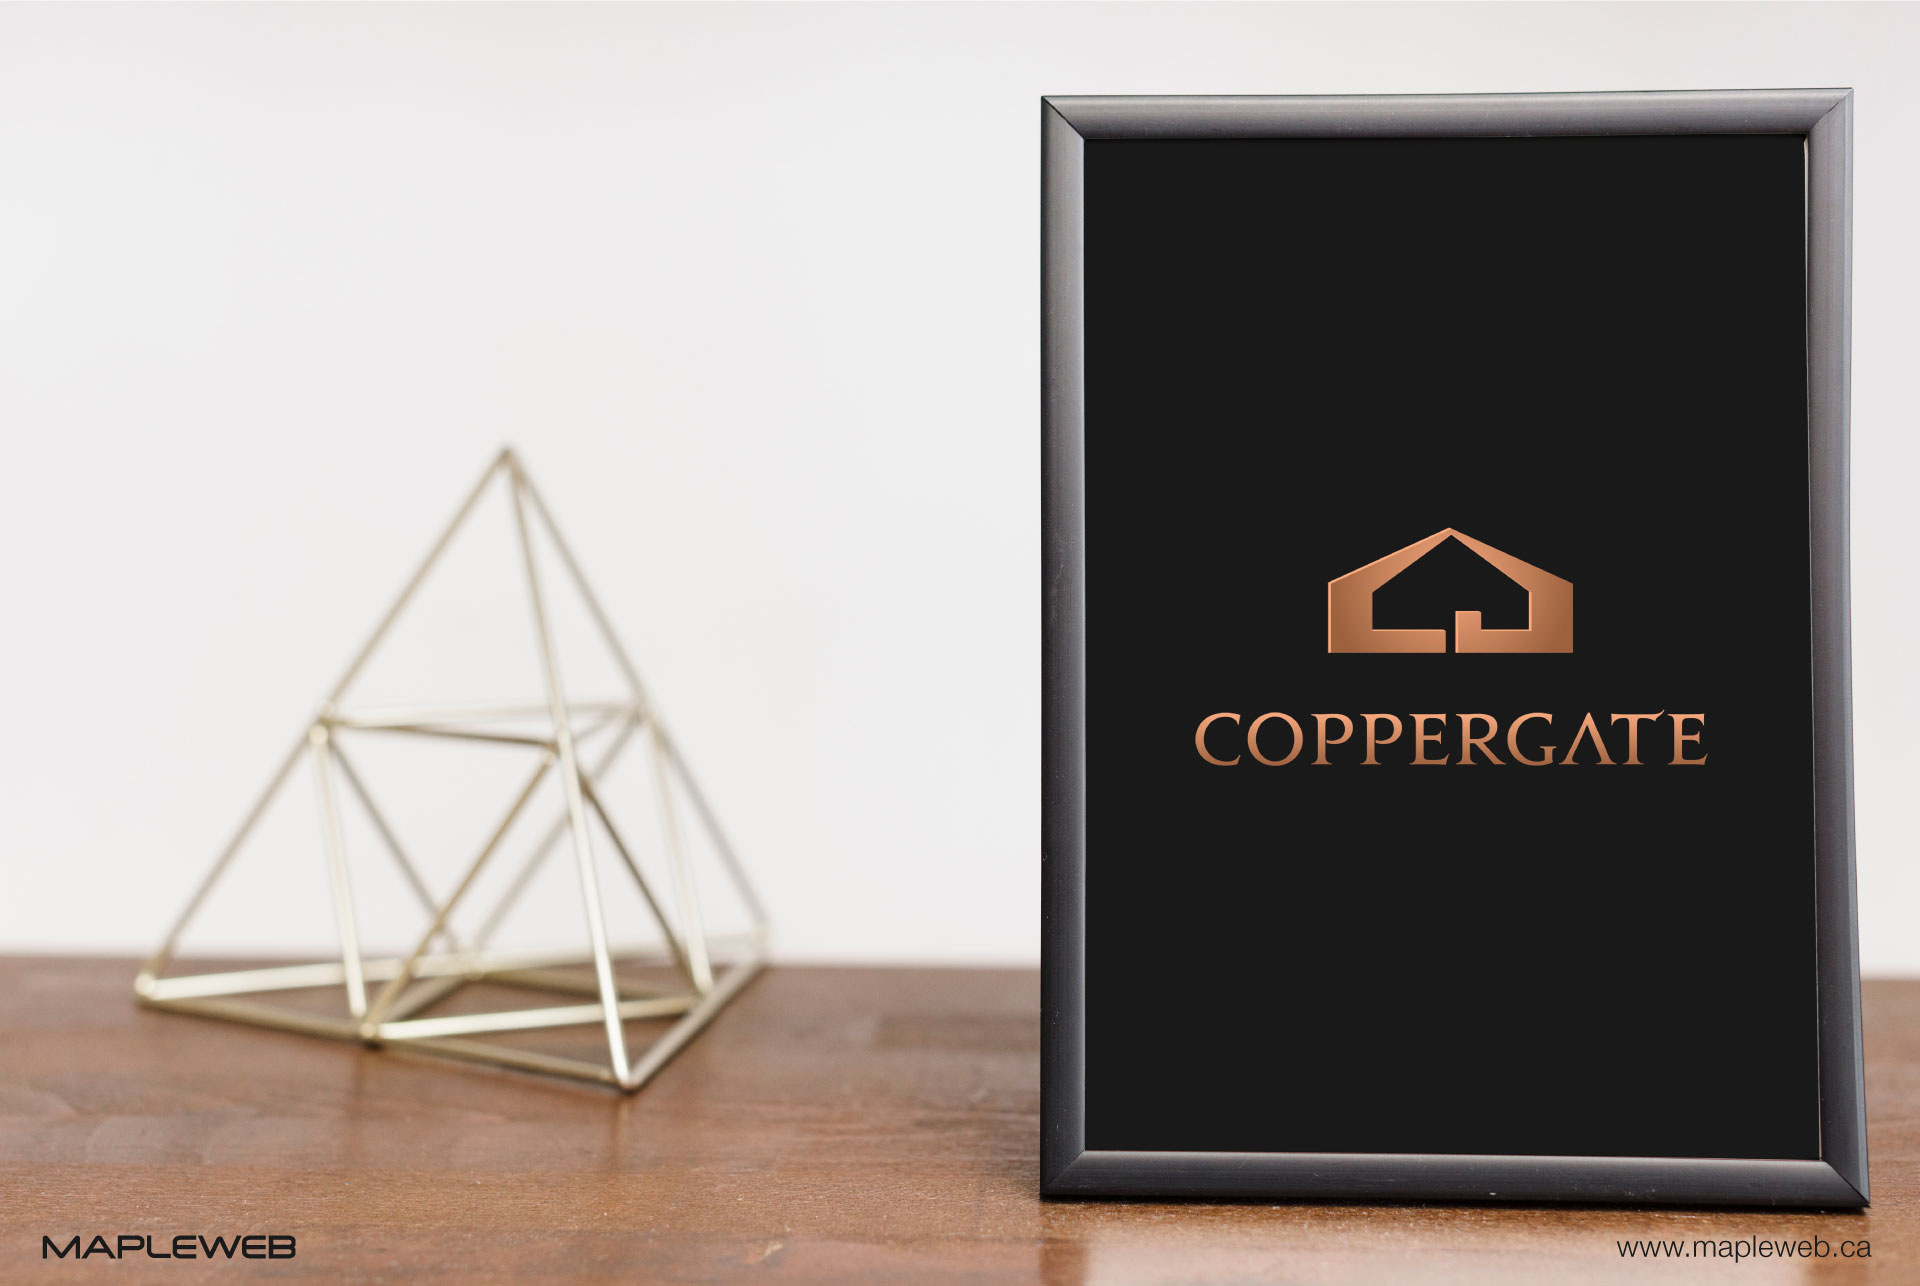 coppergate-brand-logo-design-by-mapleweb-vancouver-canada-signage-mock